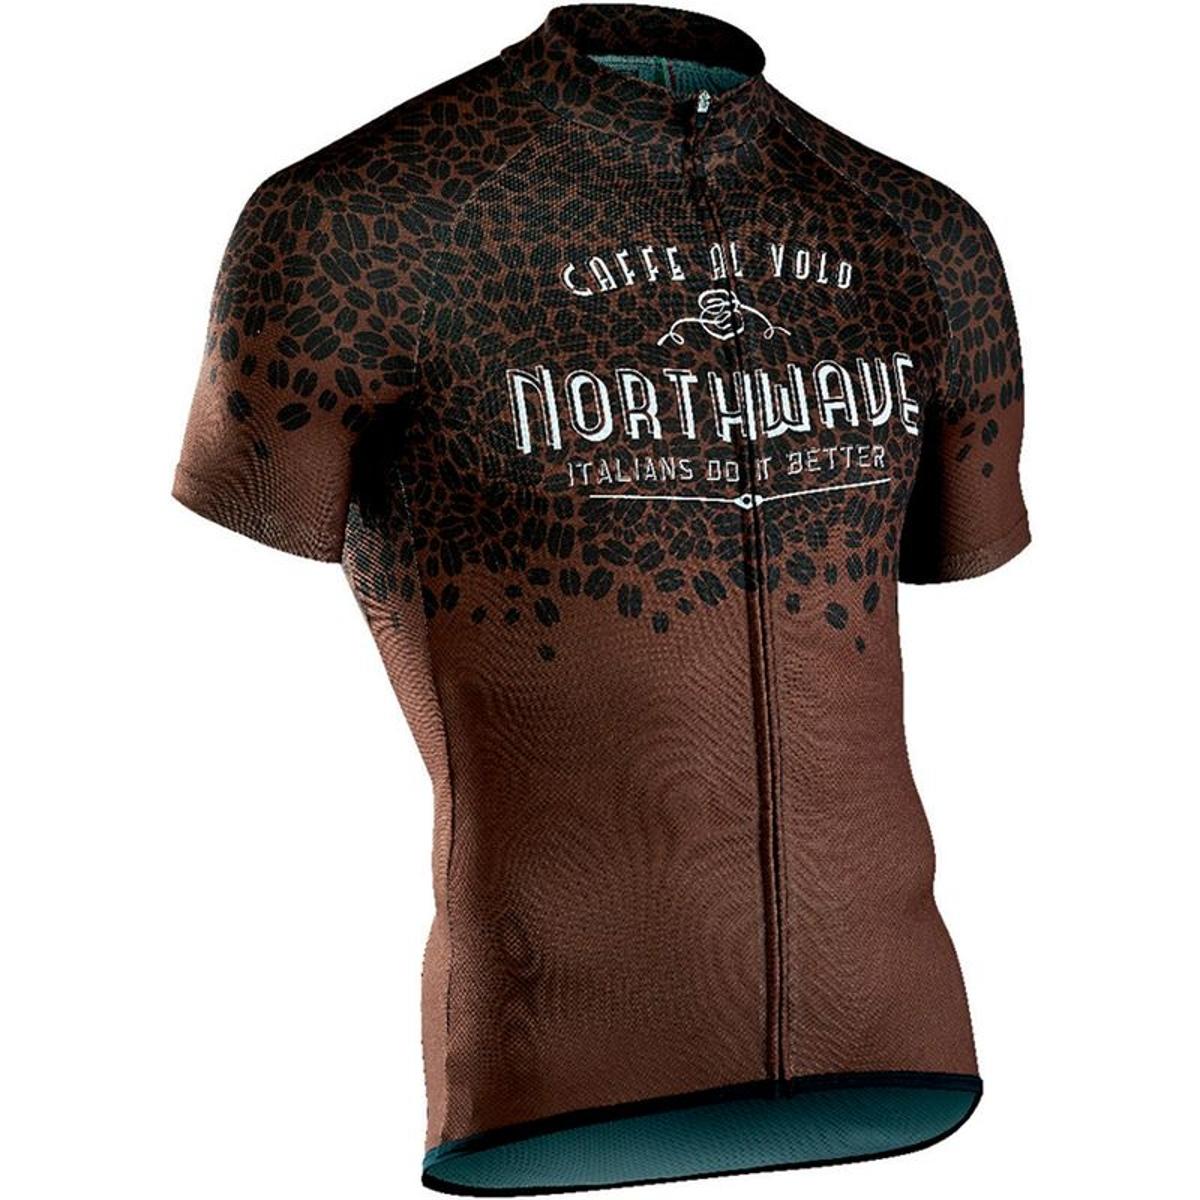 Caffealvolo - Maillot manches courtes Homme - marron